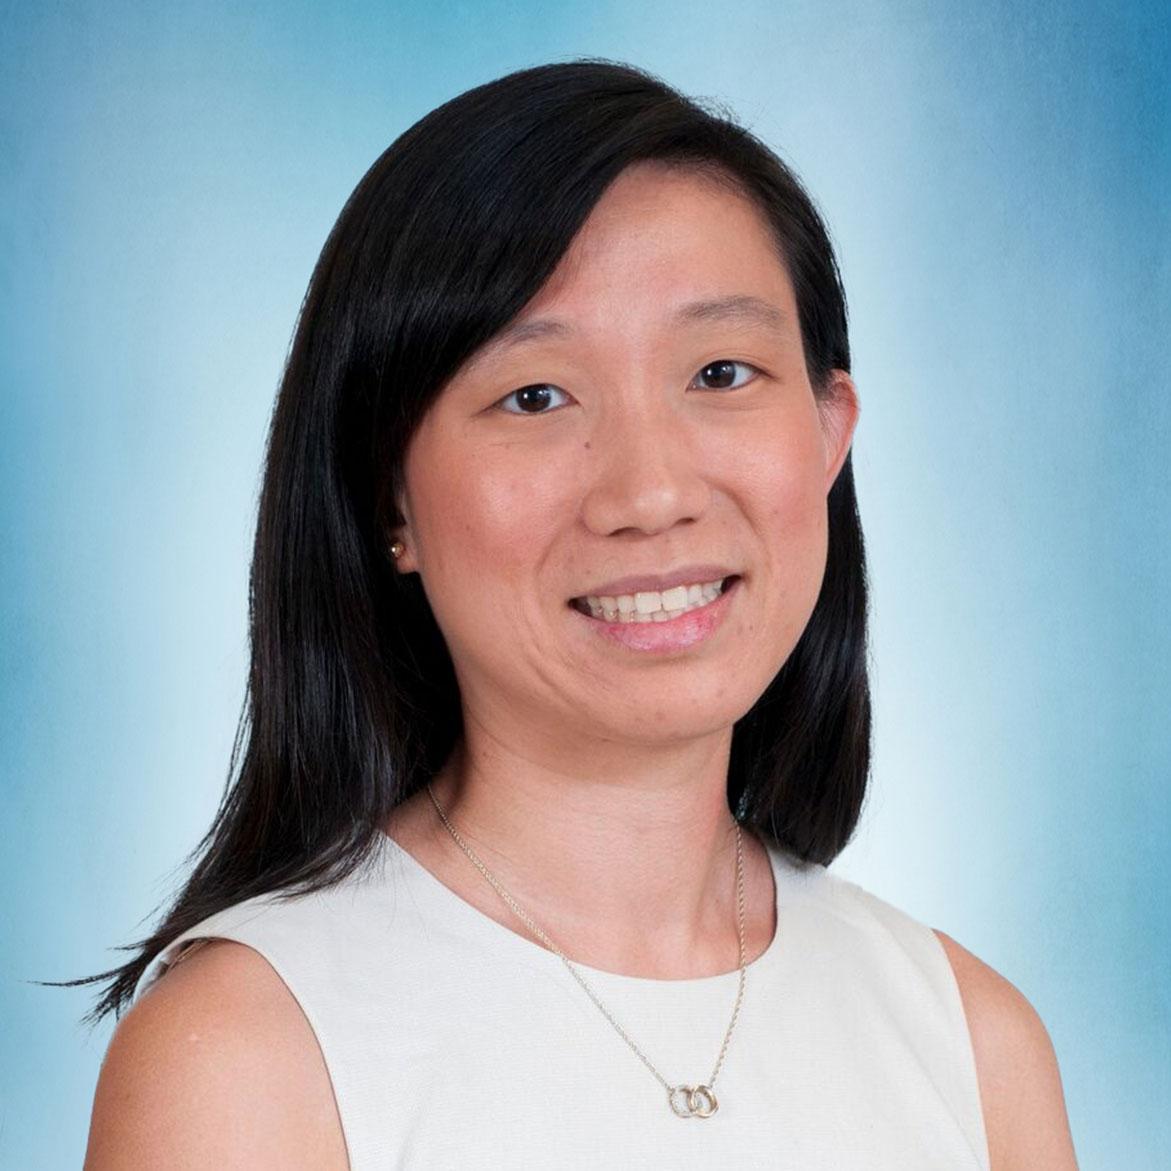 Headshot of Kimberly Ting, MD.